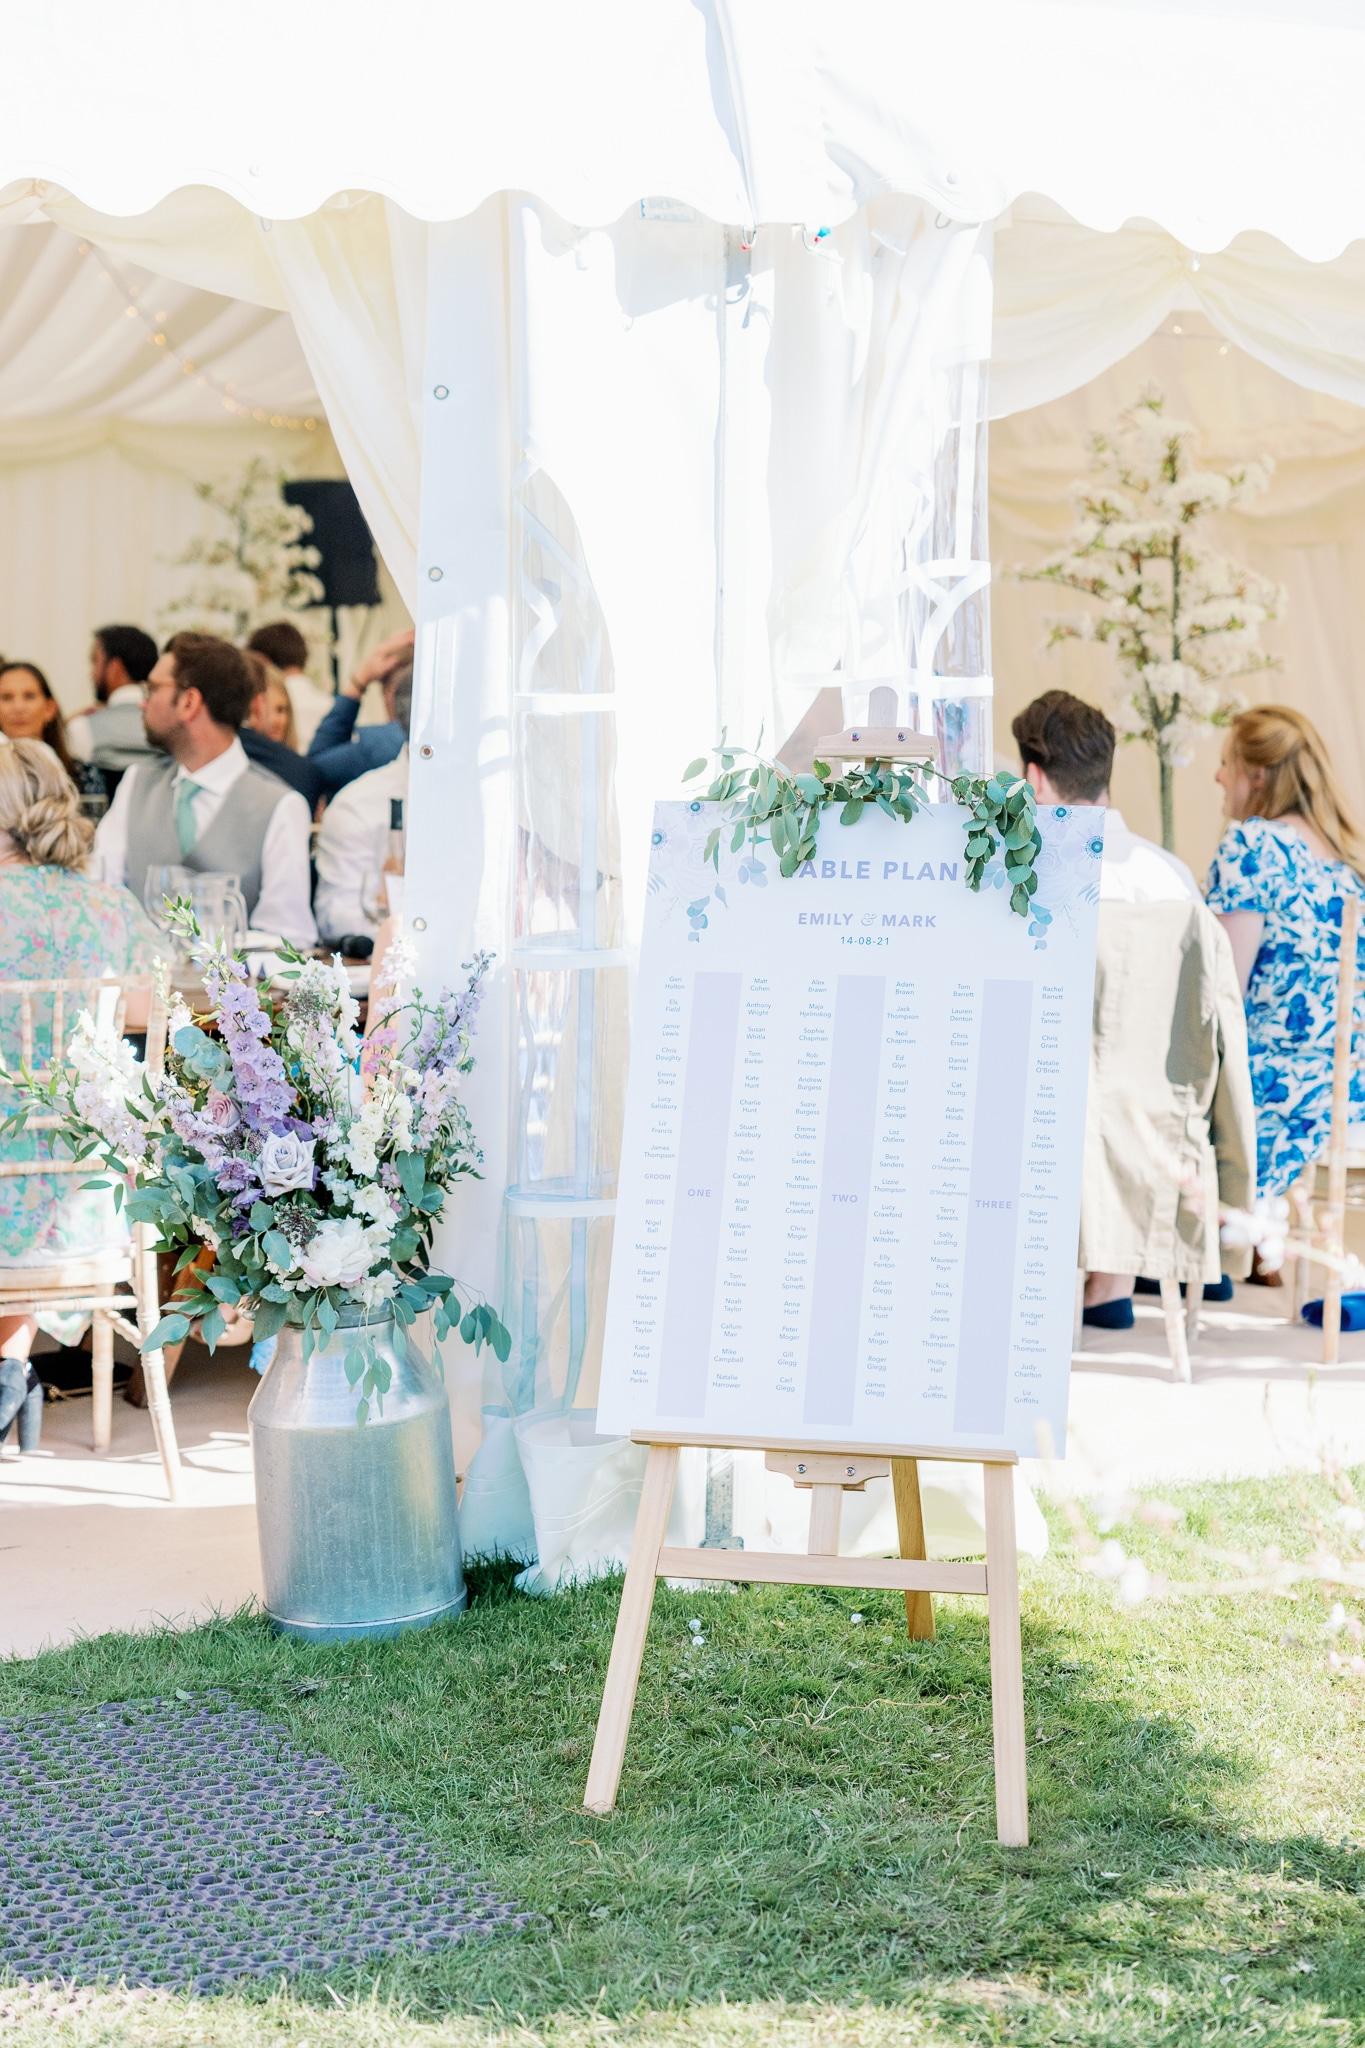 James Marquees Hire wedding venues in Hastings